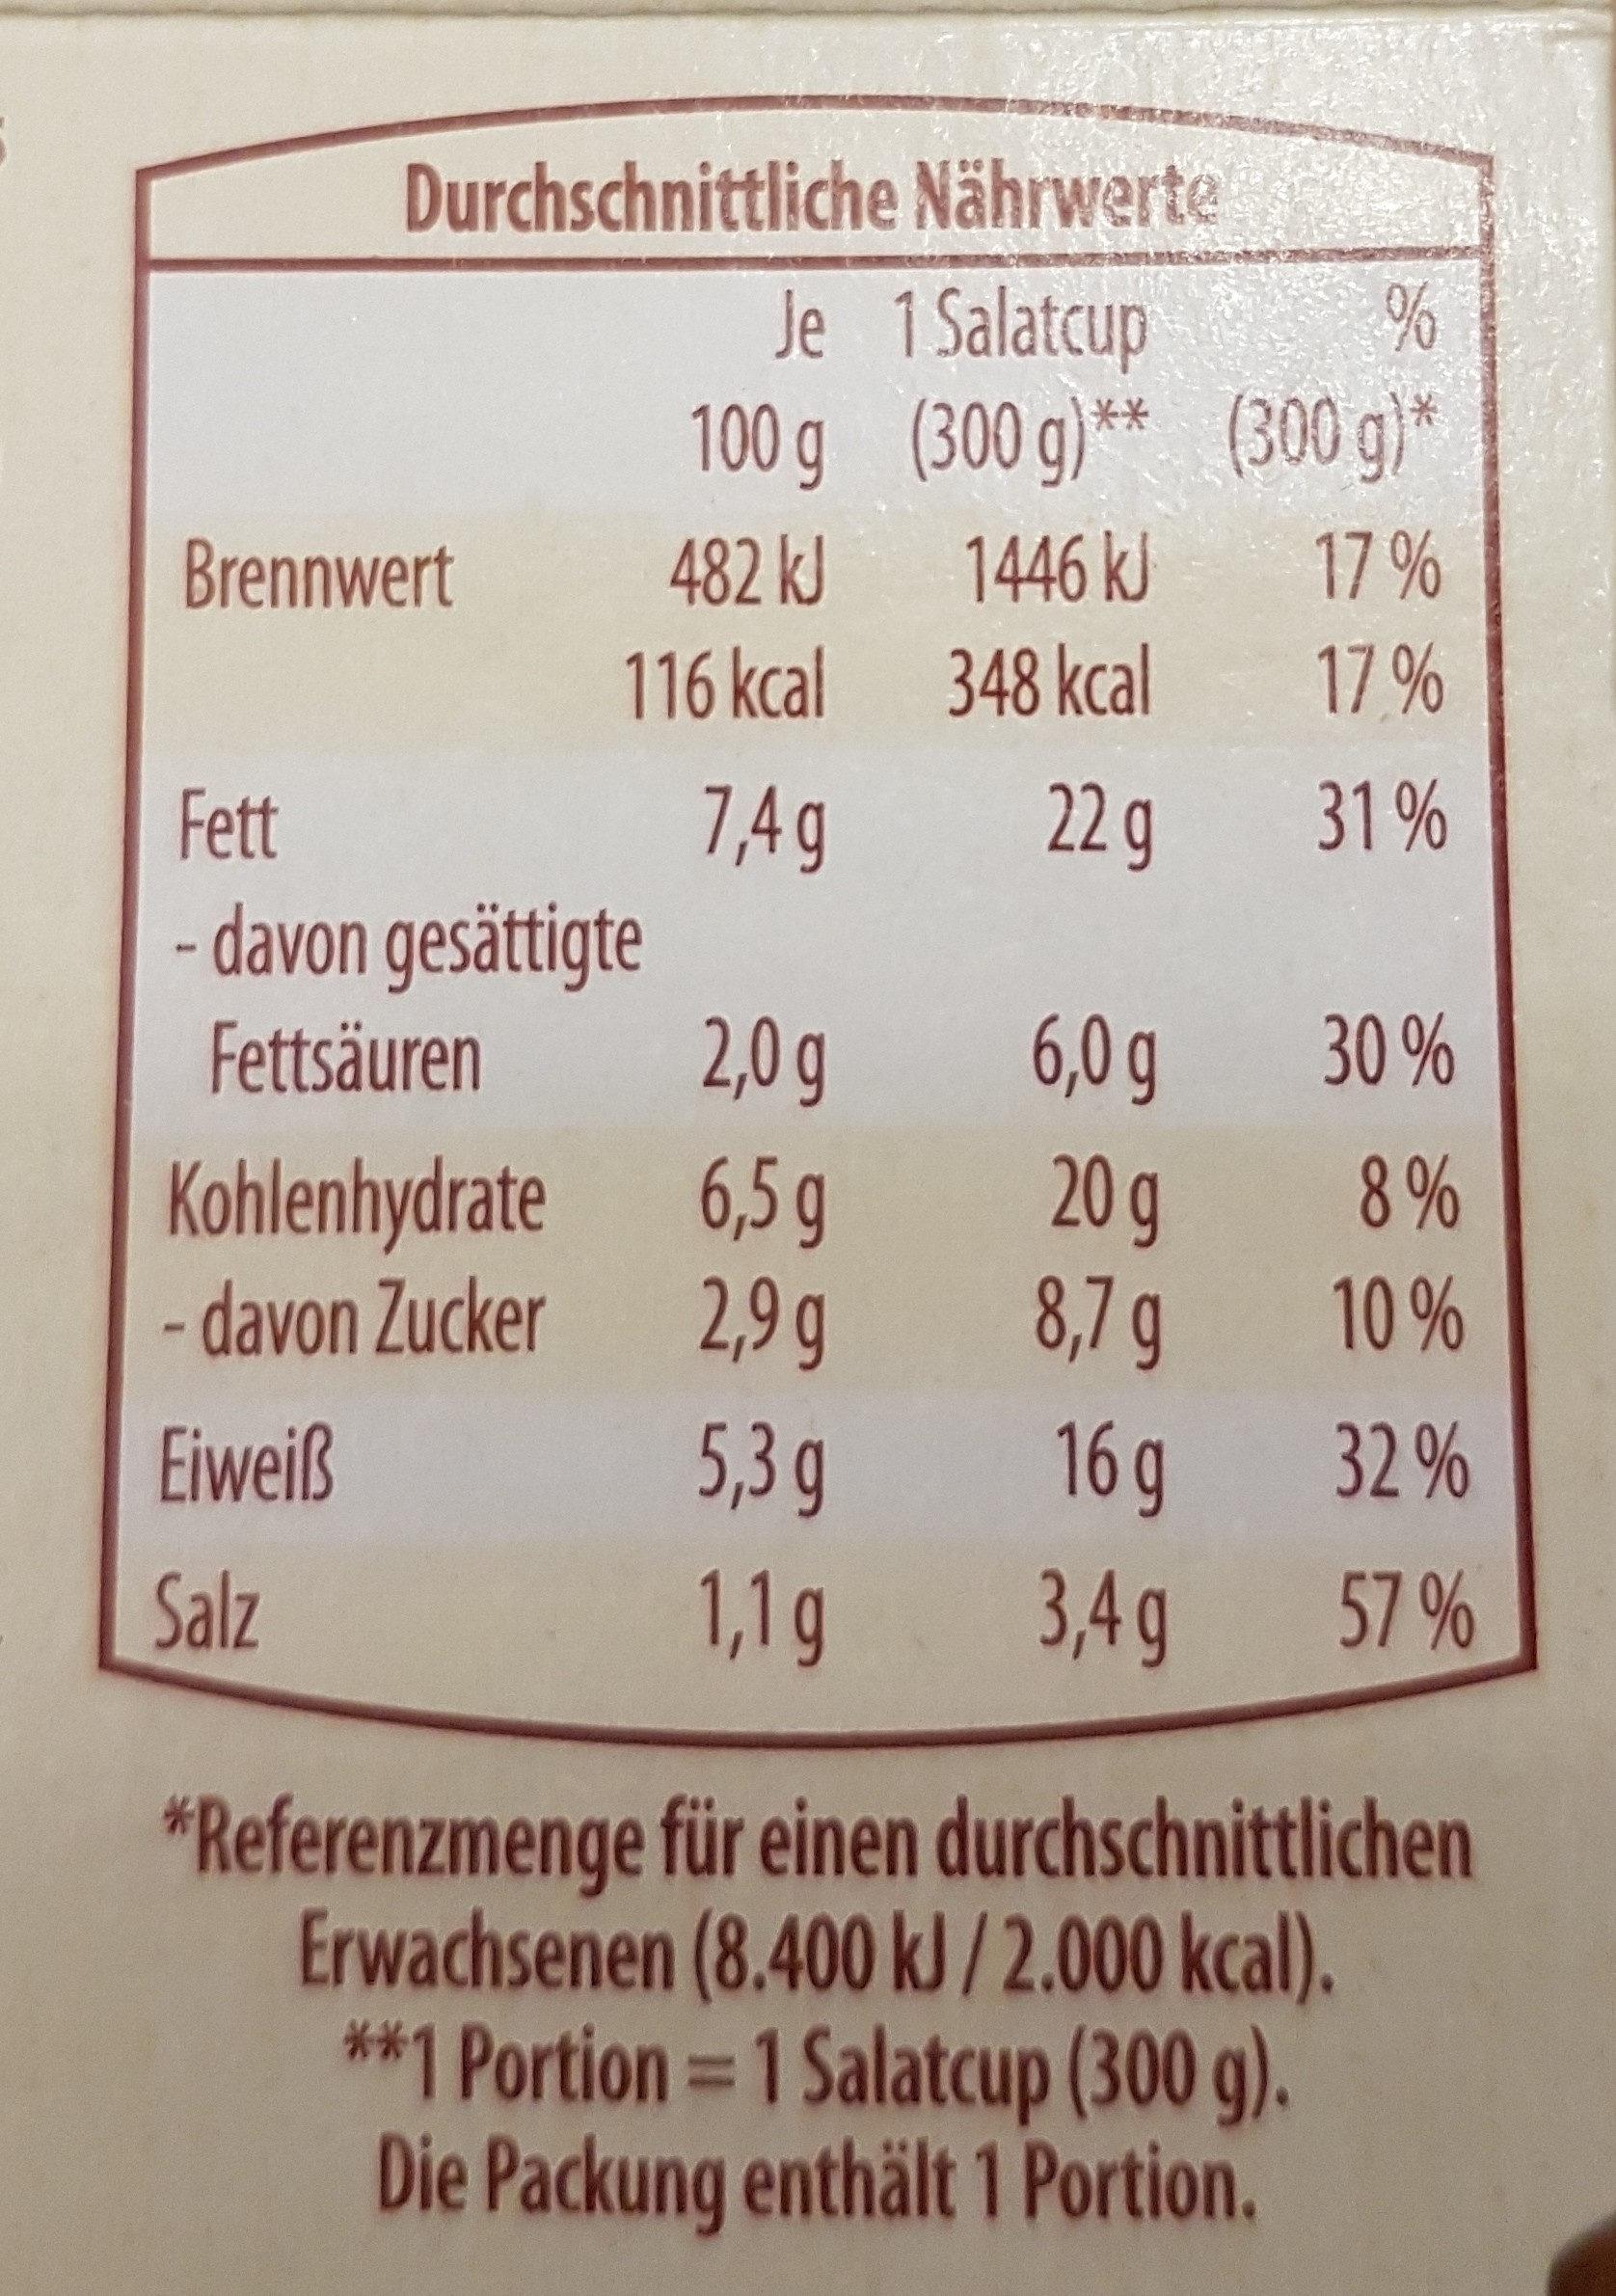 SALATCUP KASE&SCHINKEN - Nutrition facts - de